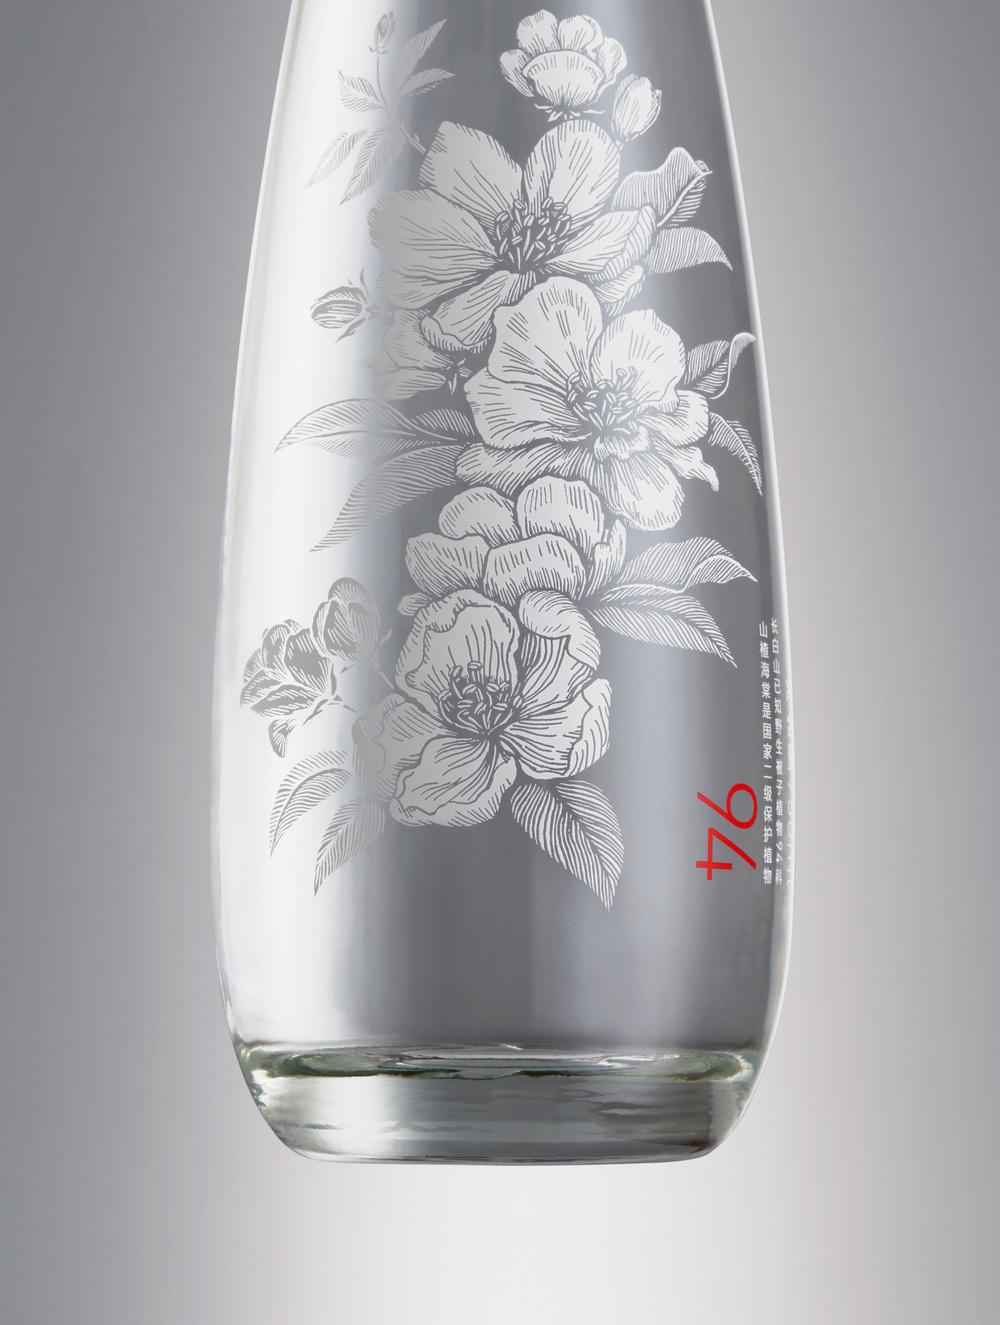 7_Nongfu_Premium_CloseUp_Flower_S.jpg